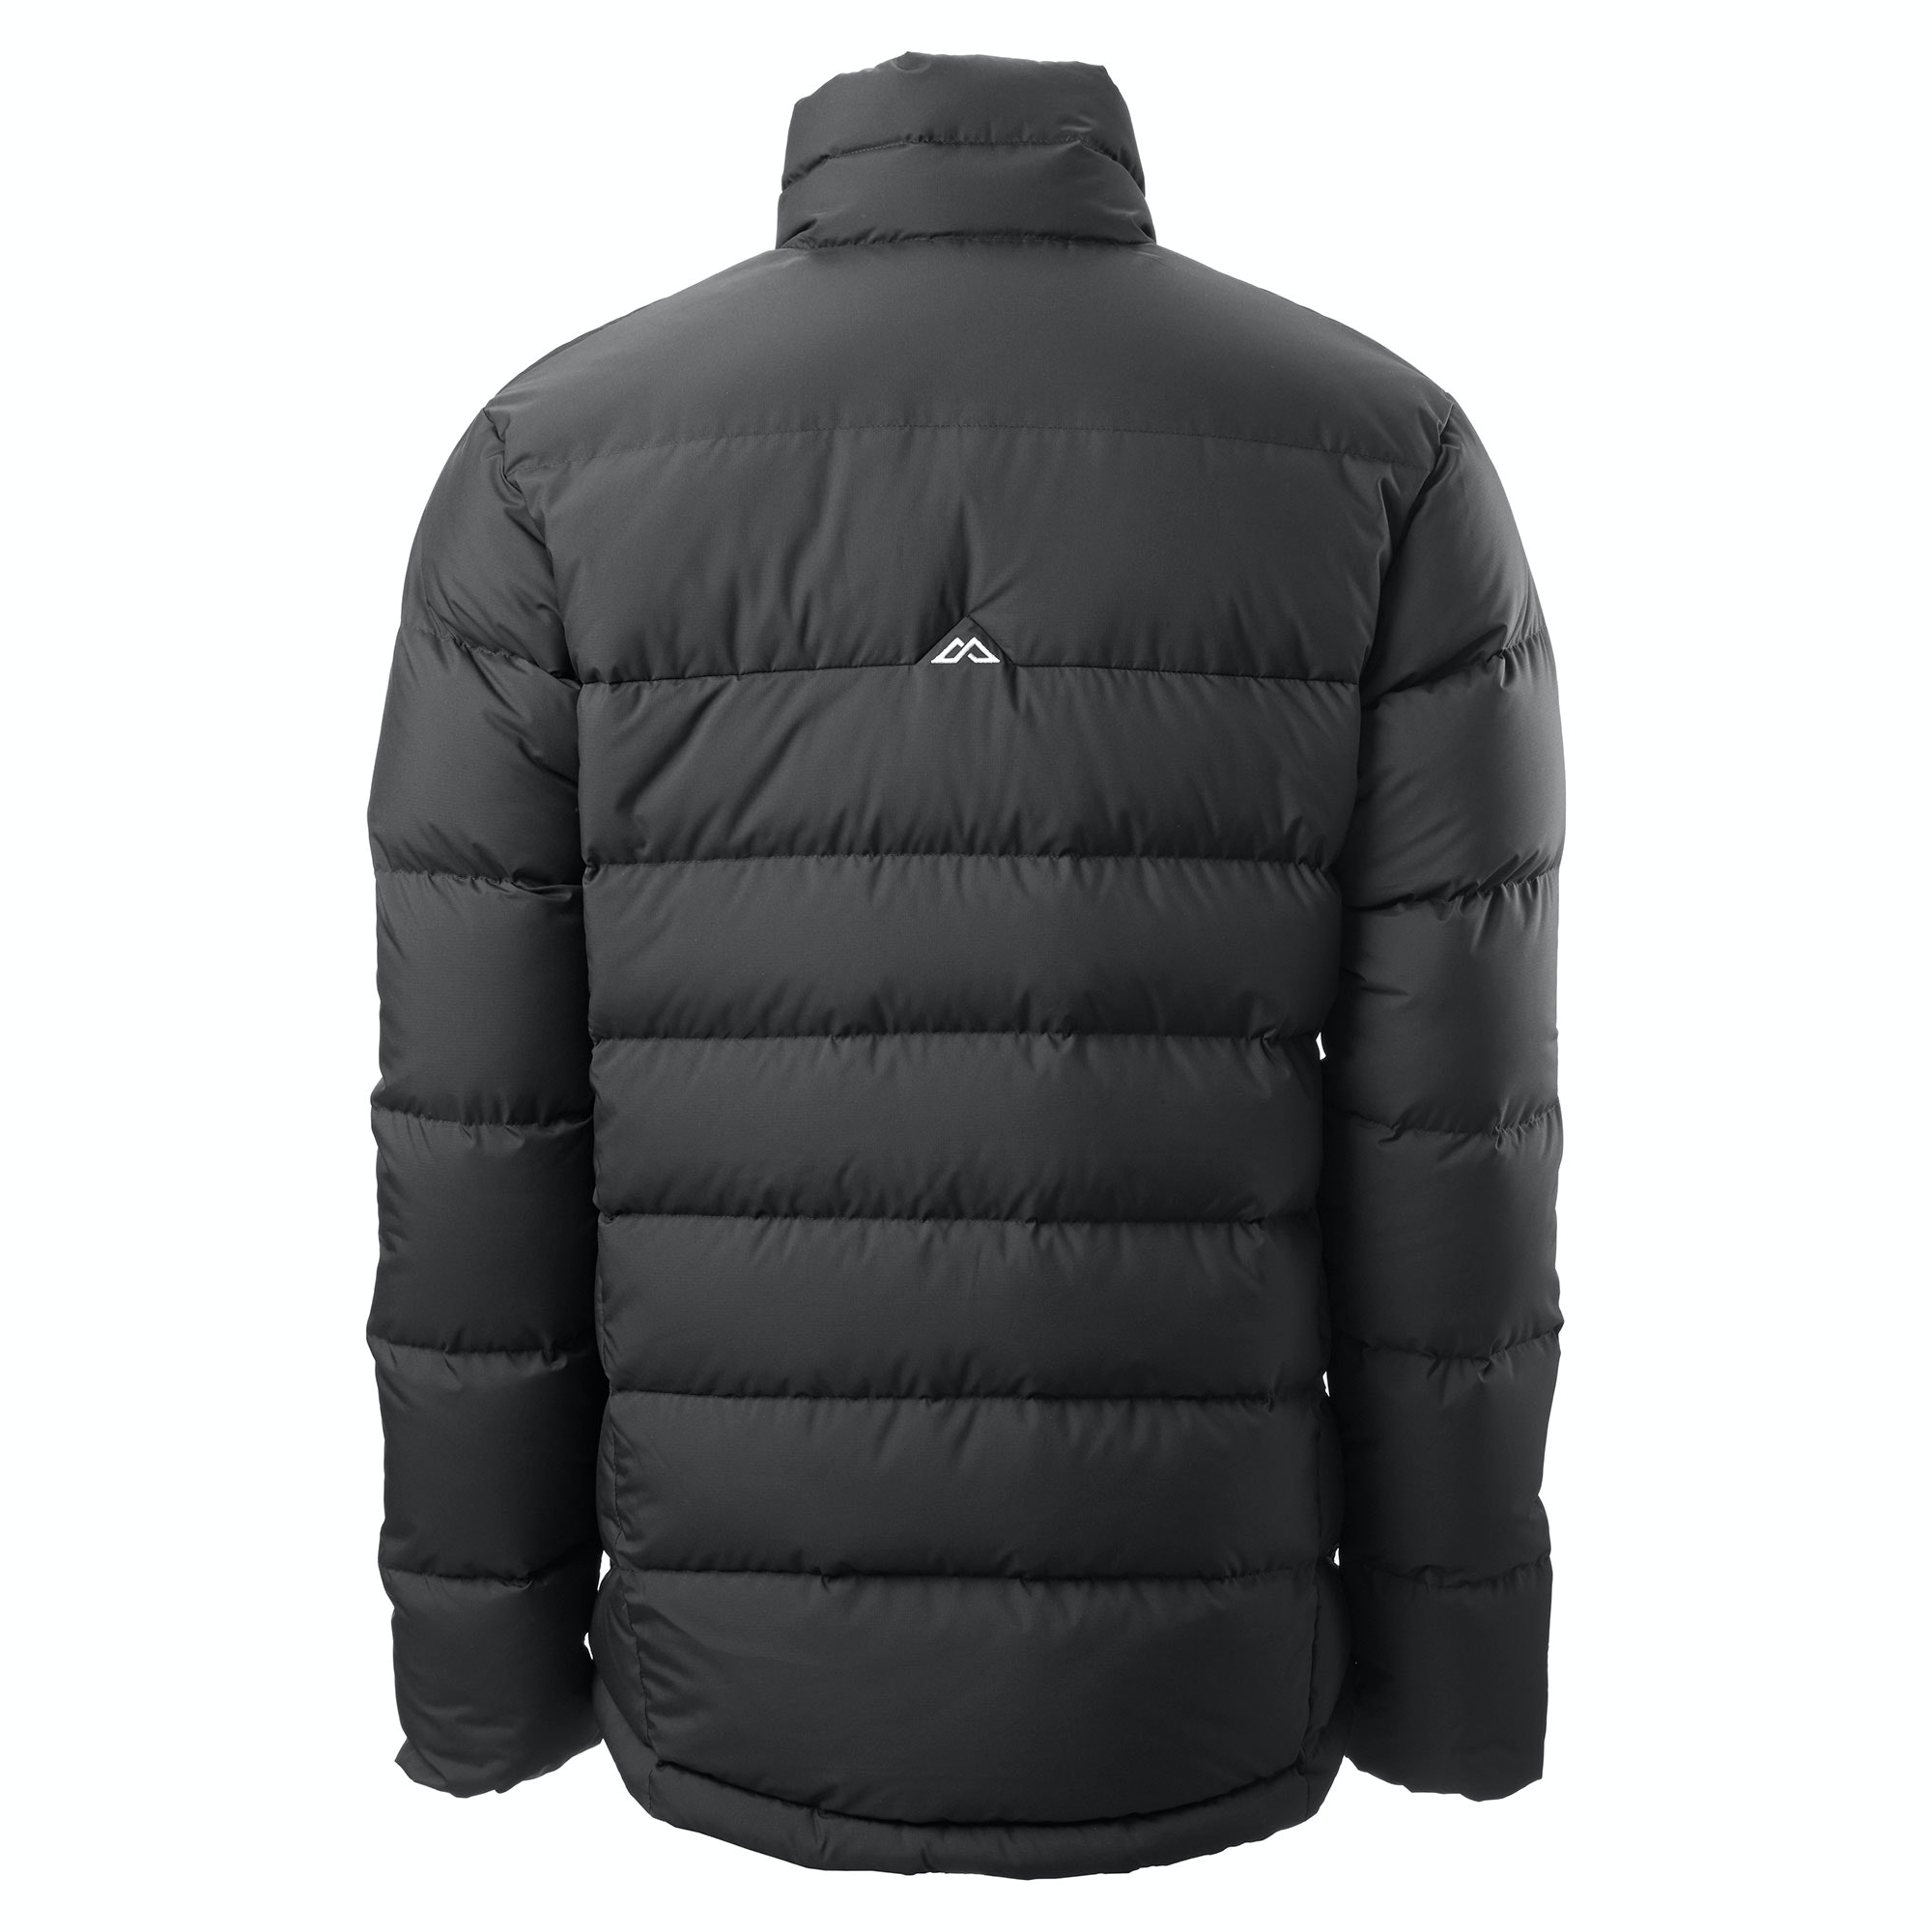 NEW-Kathmandu-Epiq-Men-039-s-Warm-Winter-Duck-Down-Puffer-Jacket-v2 thumbnail 7